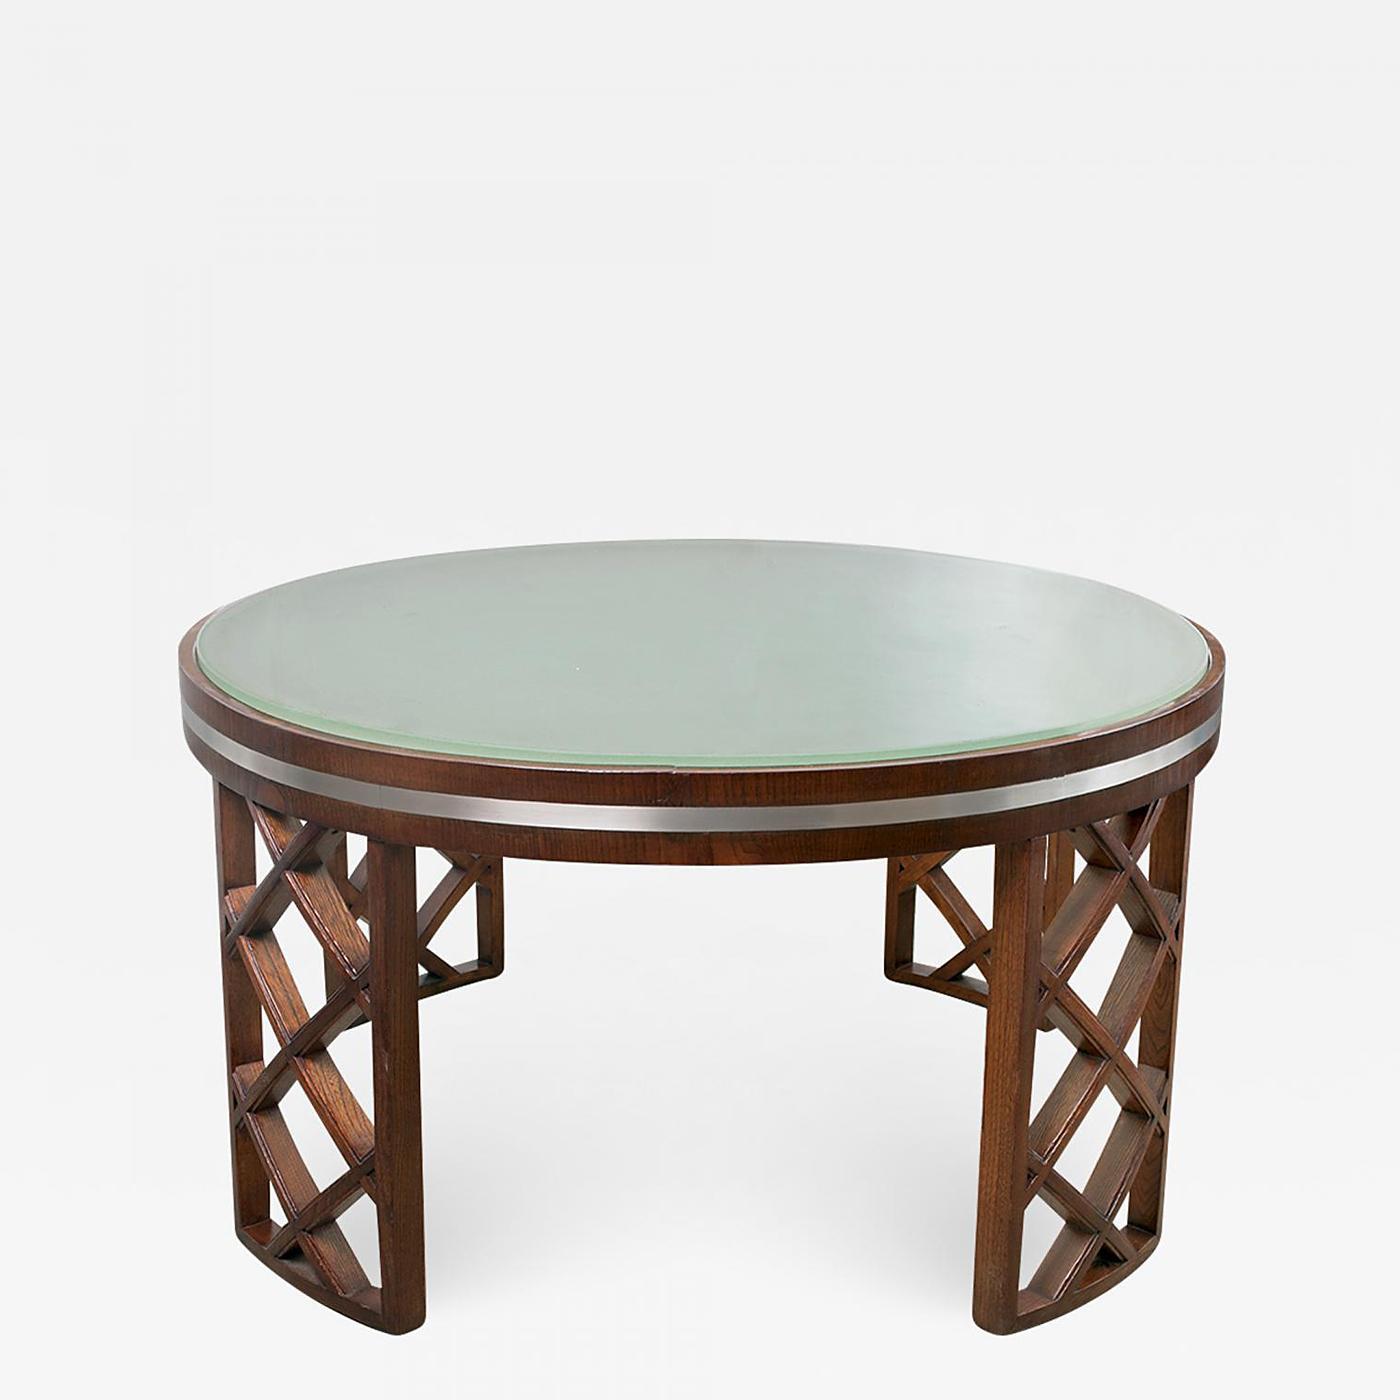 Art Deco Coffee Table Brisbane: SWEDISH ART DECO COFFEE TABLE WITH LATTICE LEGS